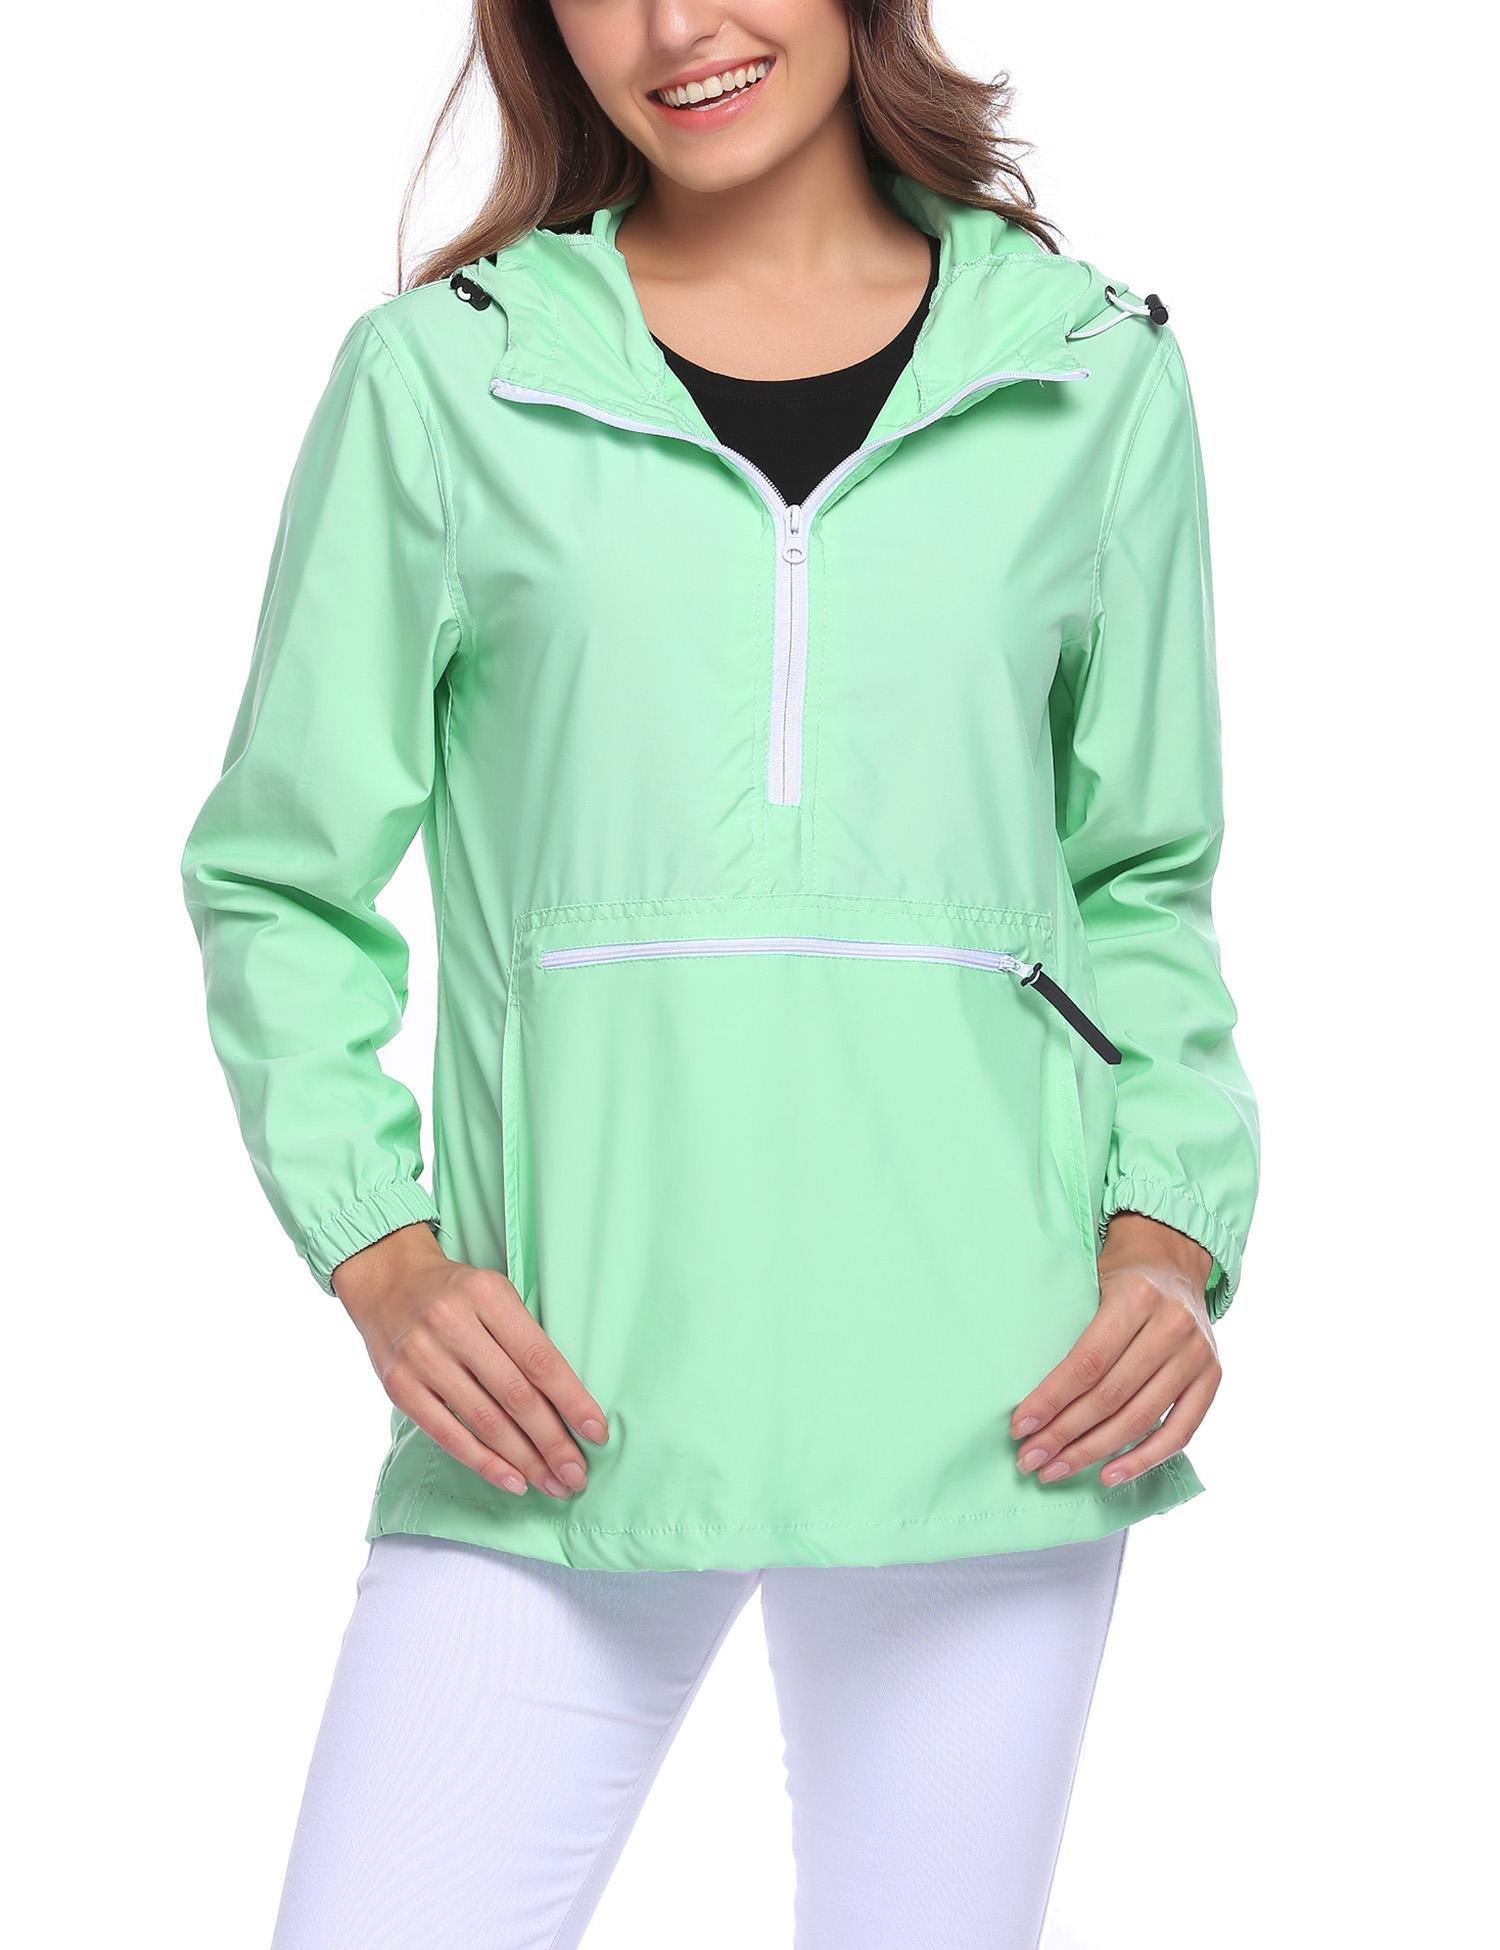 Easther Women's Rain Jacket Lightweight Windproof Waterproof Outdoor Hooded Rain Coat with Pockets